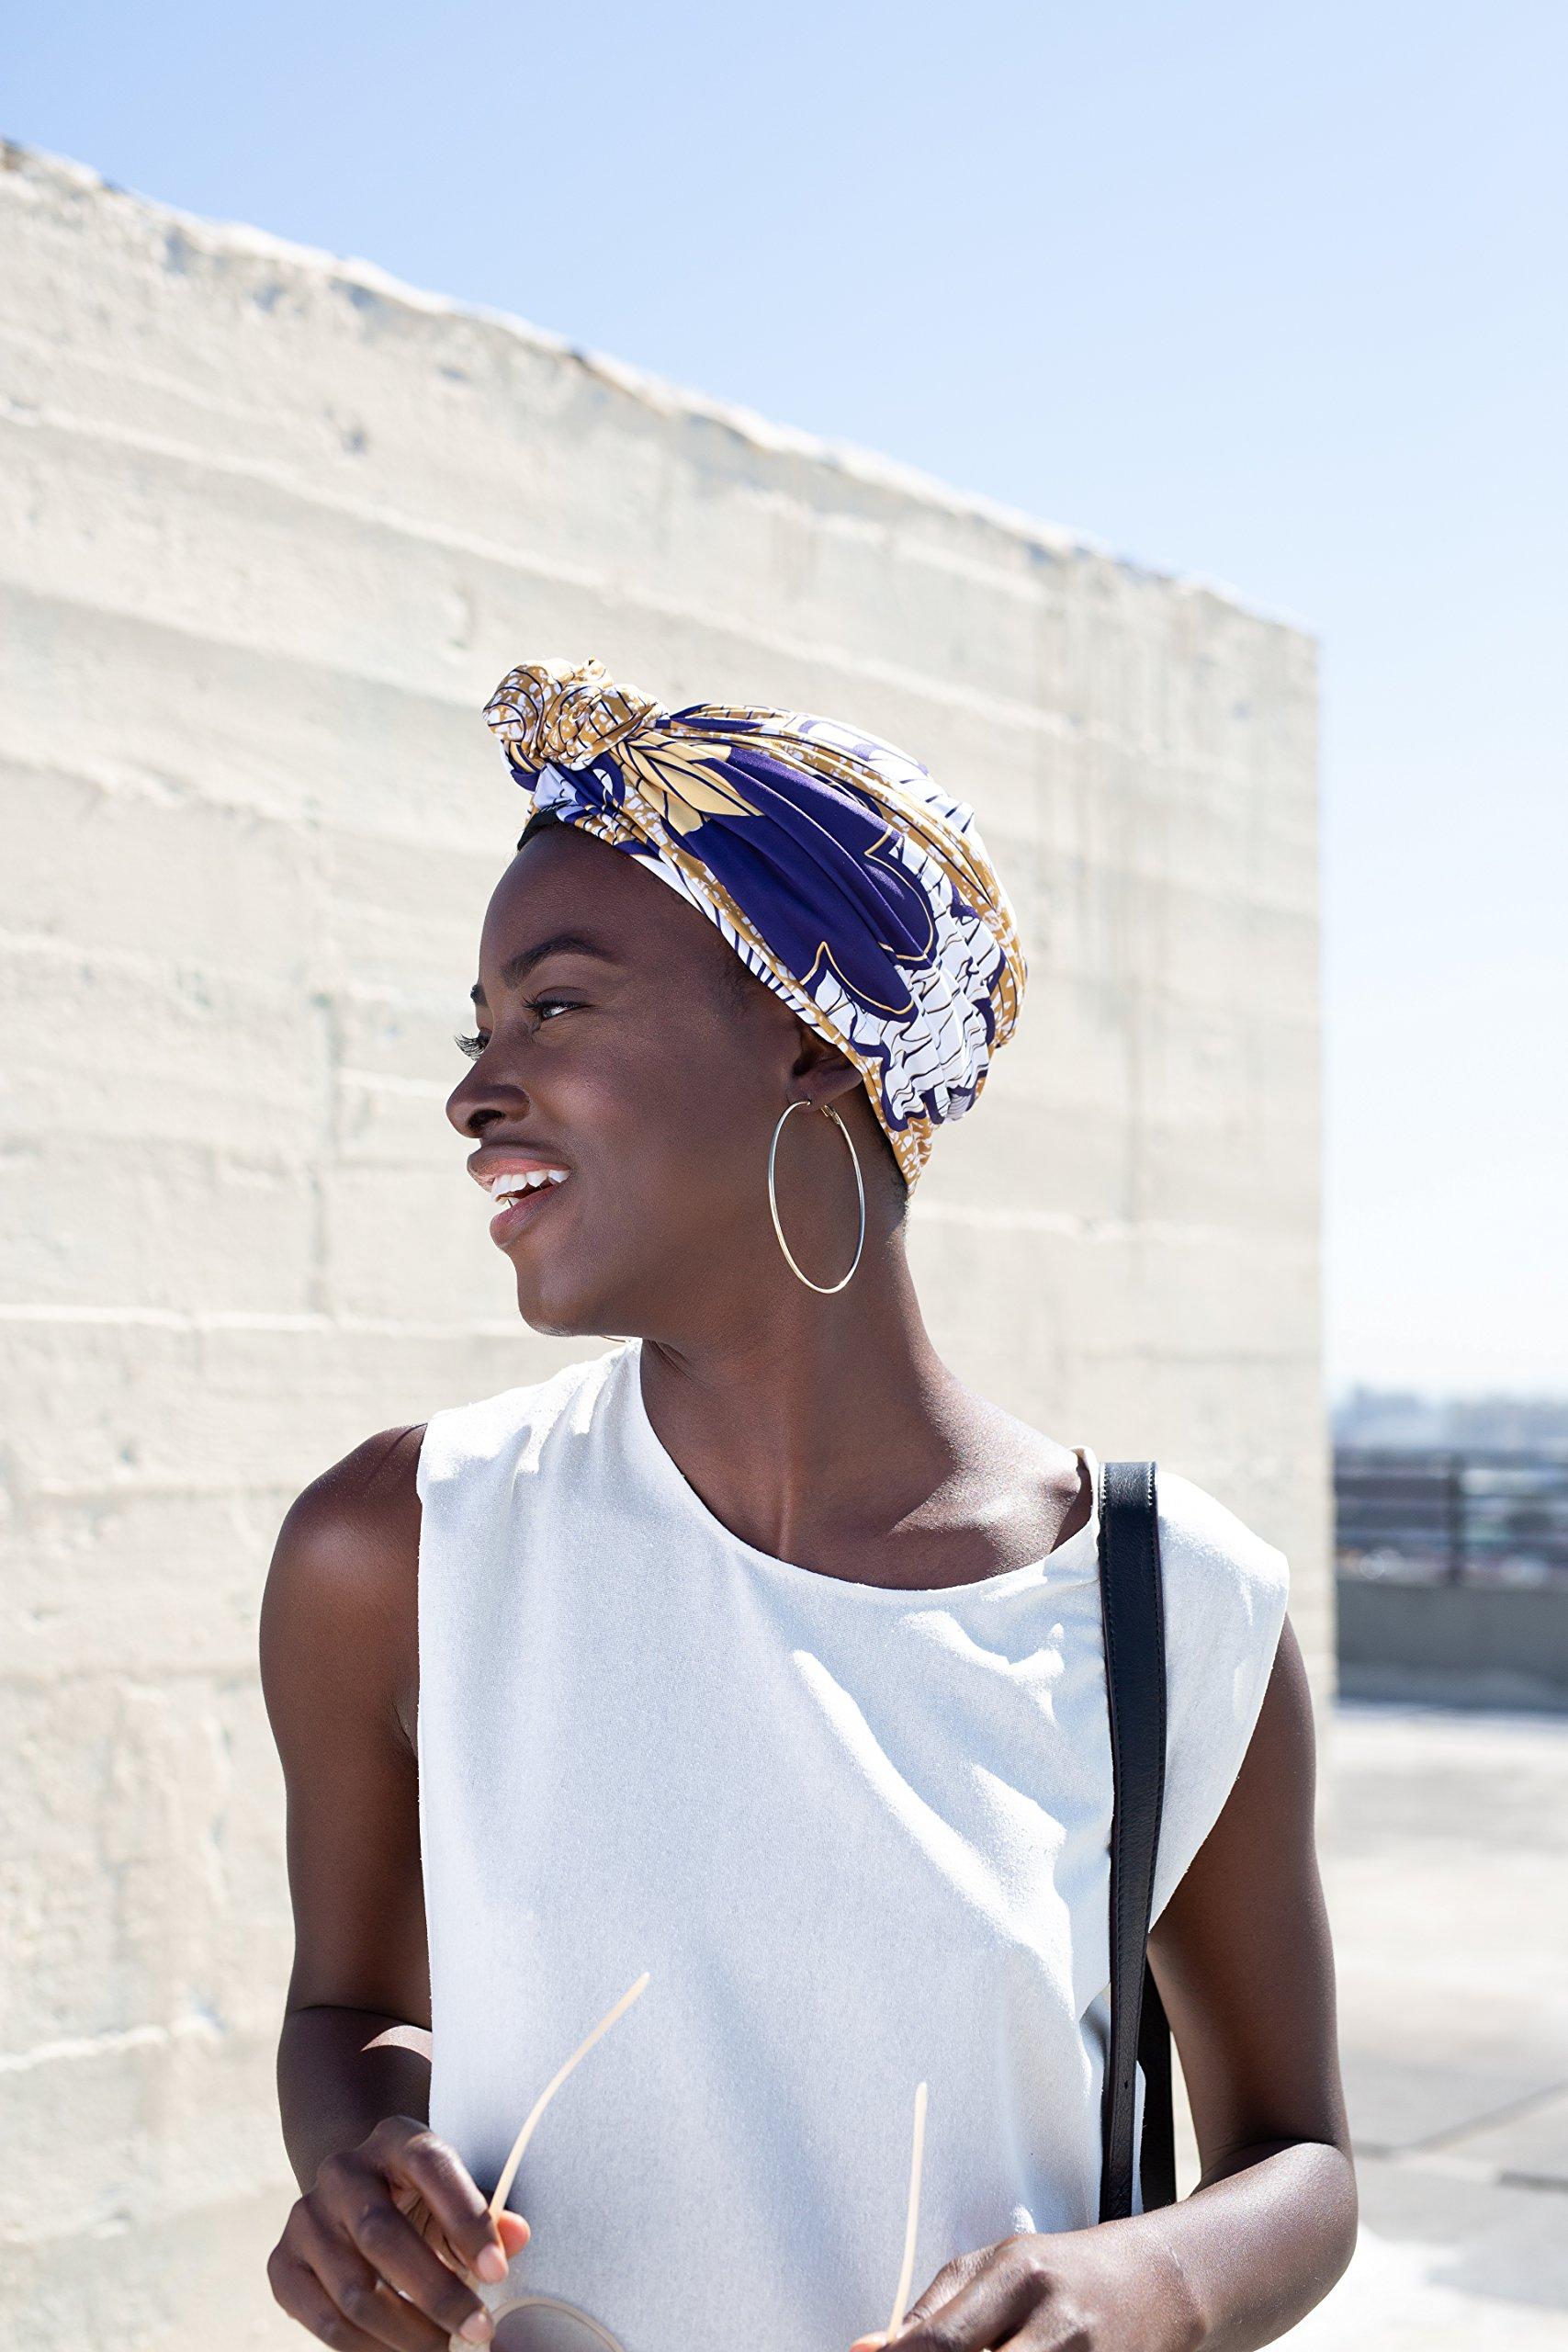 Grace Eleyae Knot Turban, Satin-Lined Hair Care Headwear [Day & Night] Malaika by Grace Eleyae